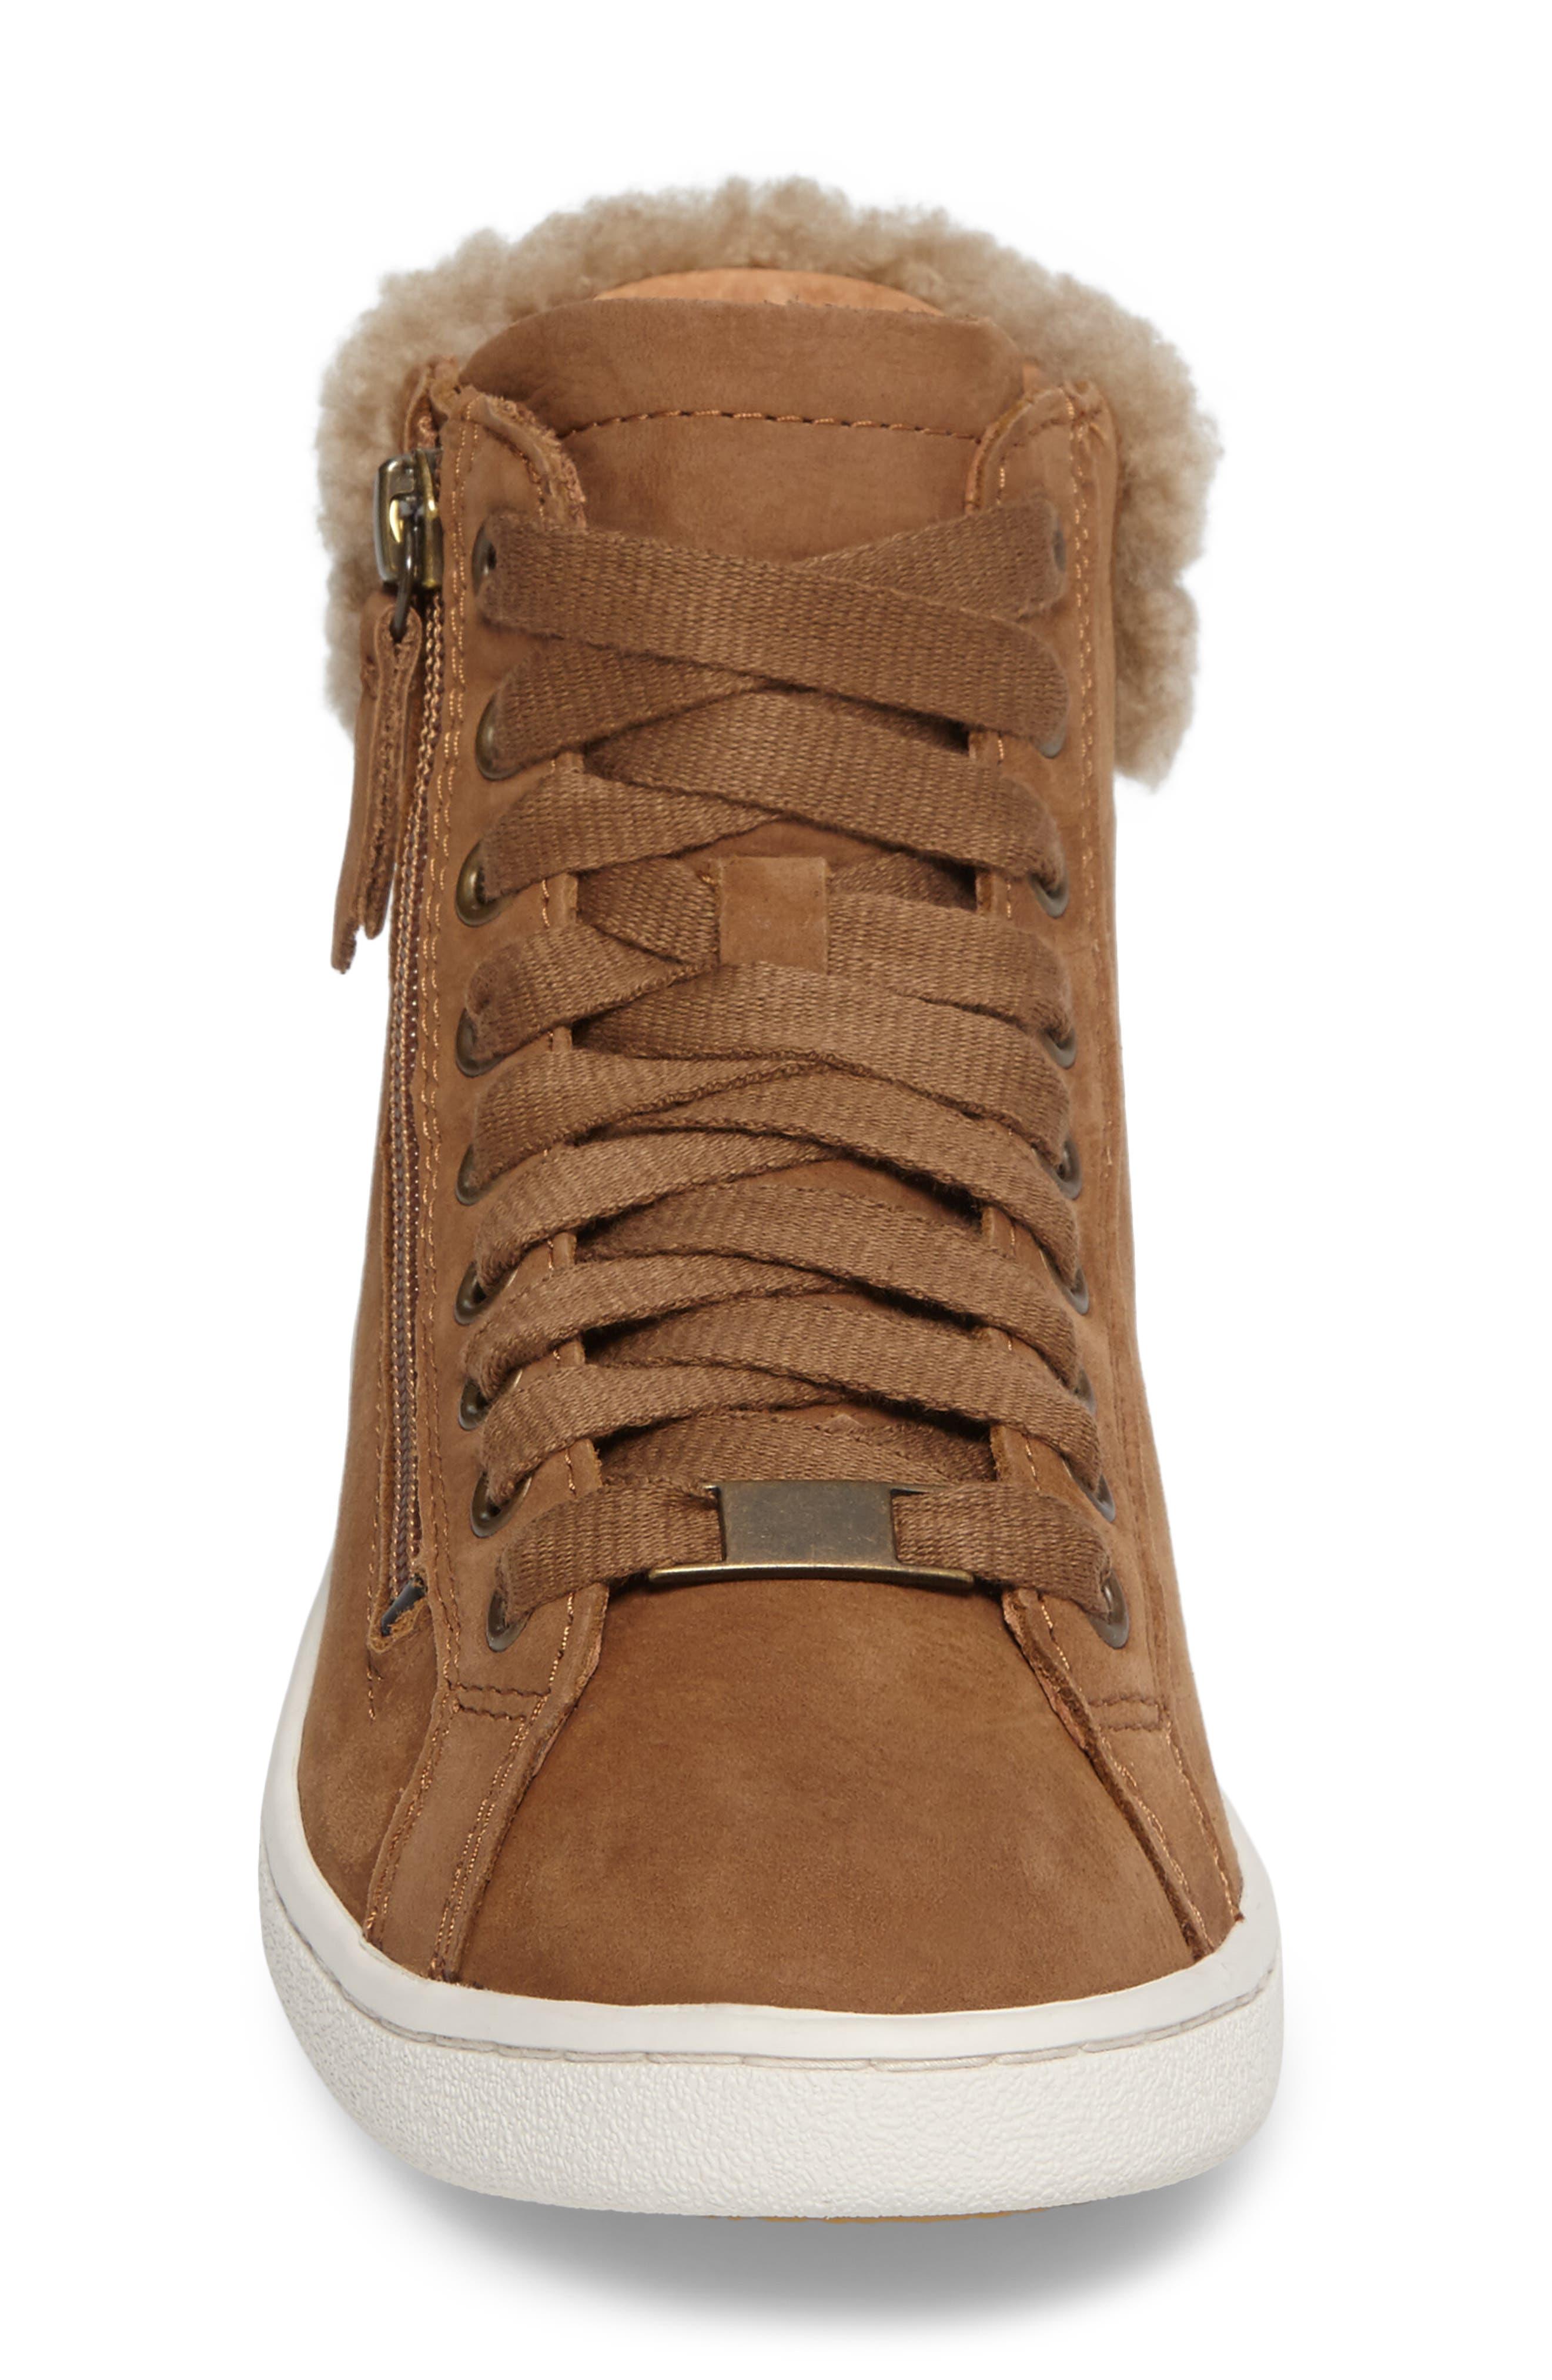 Alternate Image 4  - UGG® Olive Genuine Shearling Cuff Sneaker (Women)